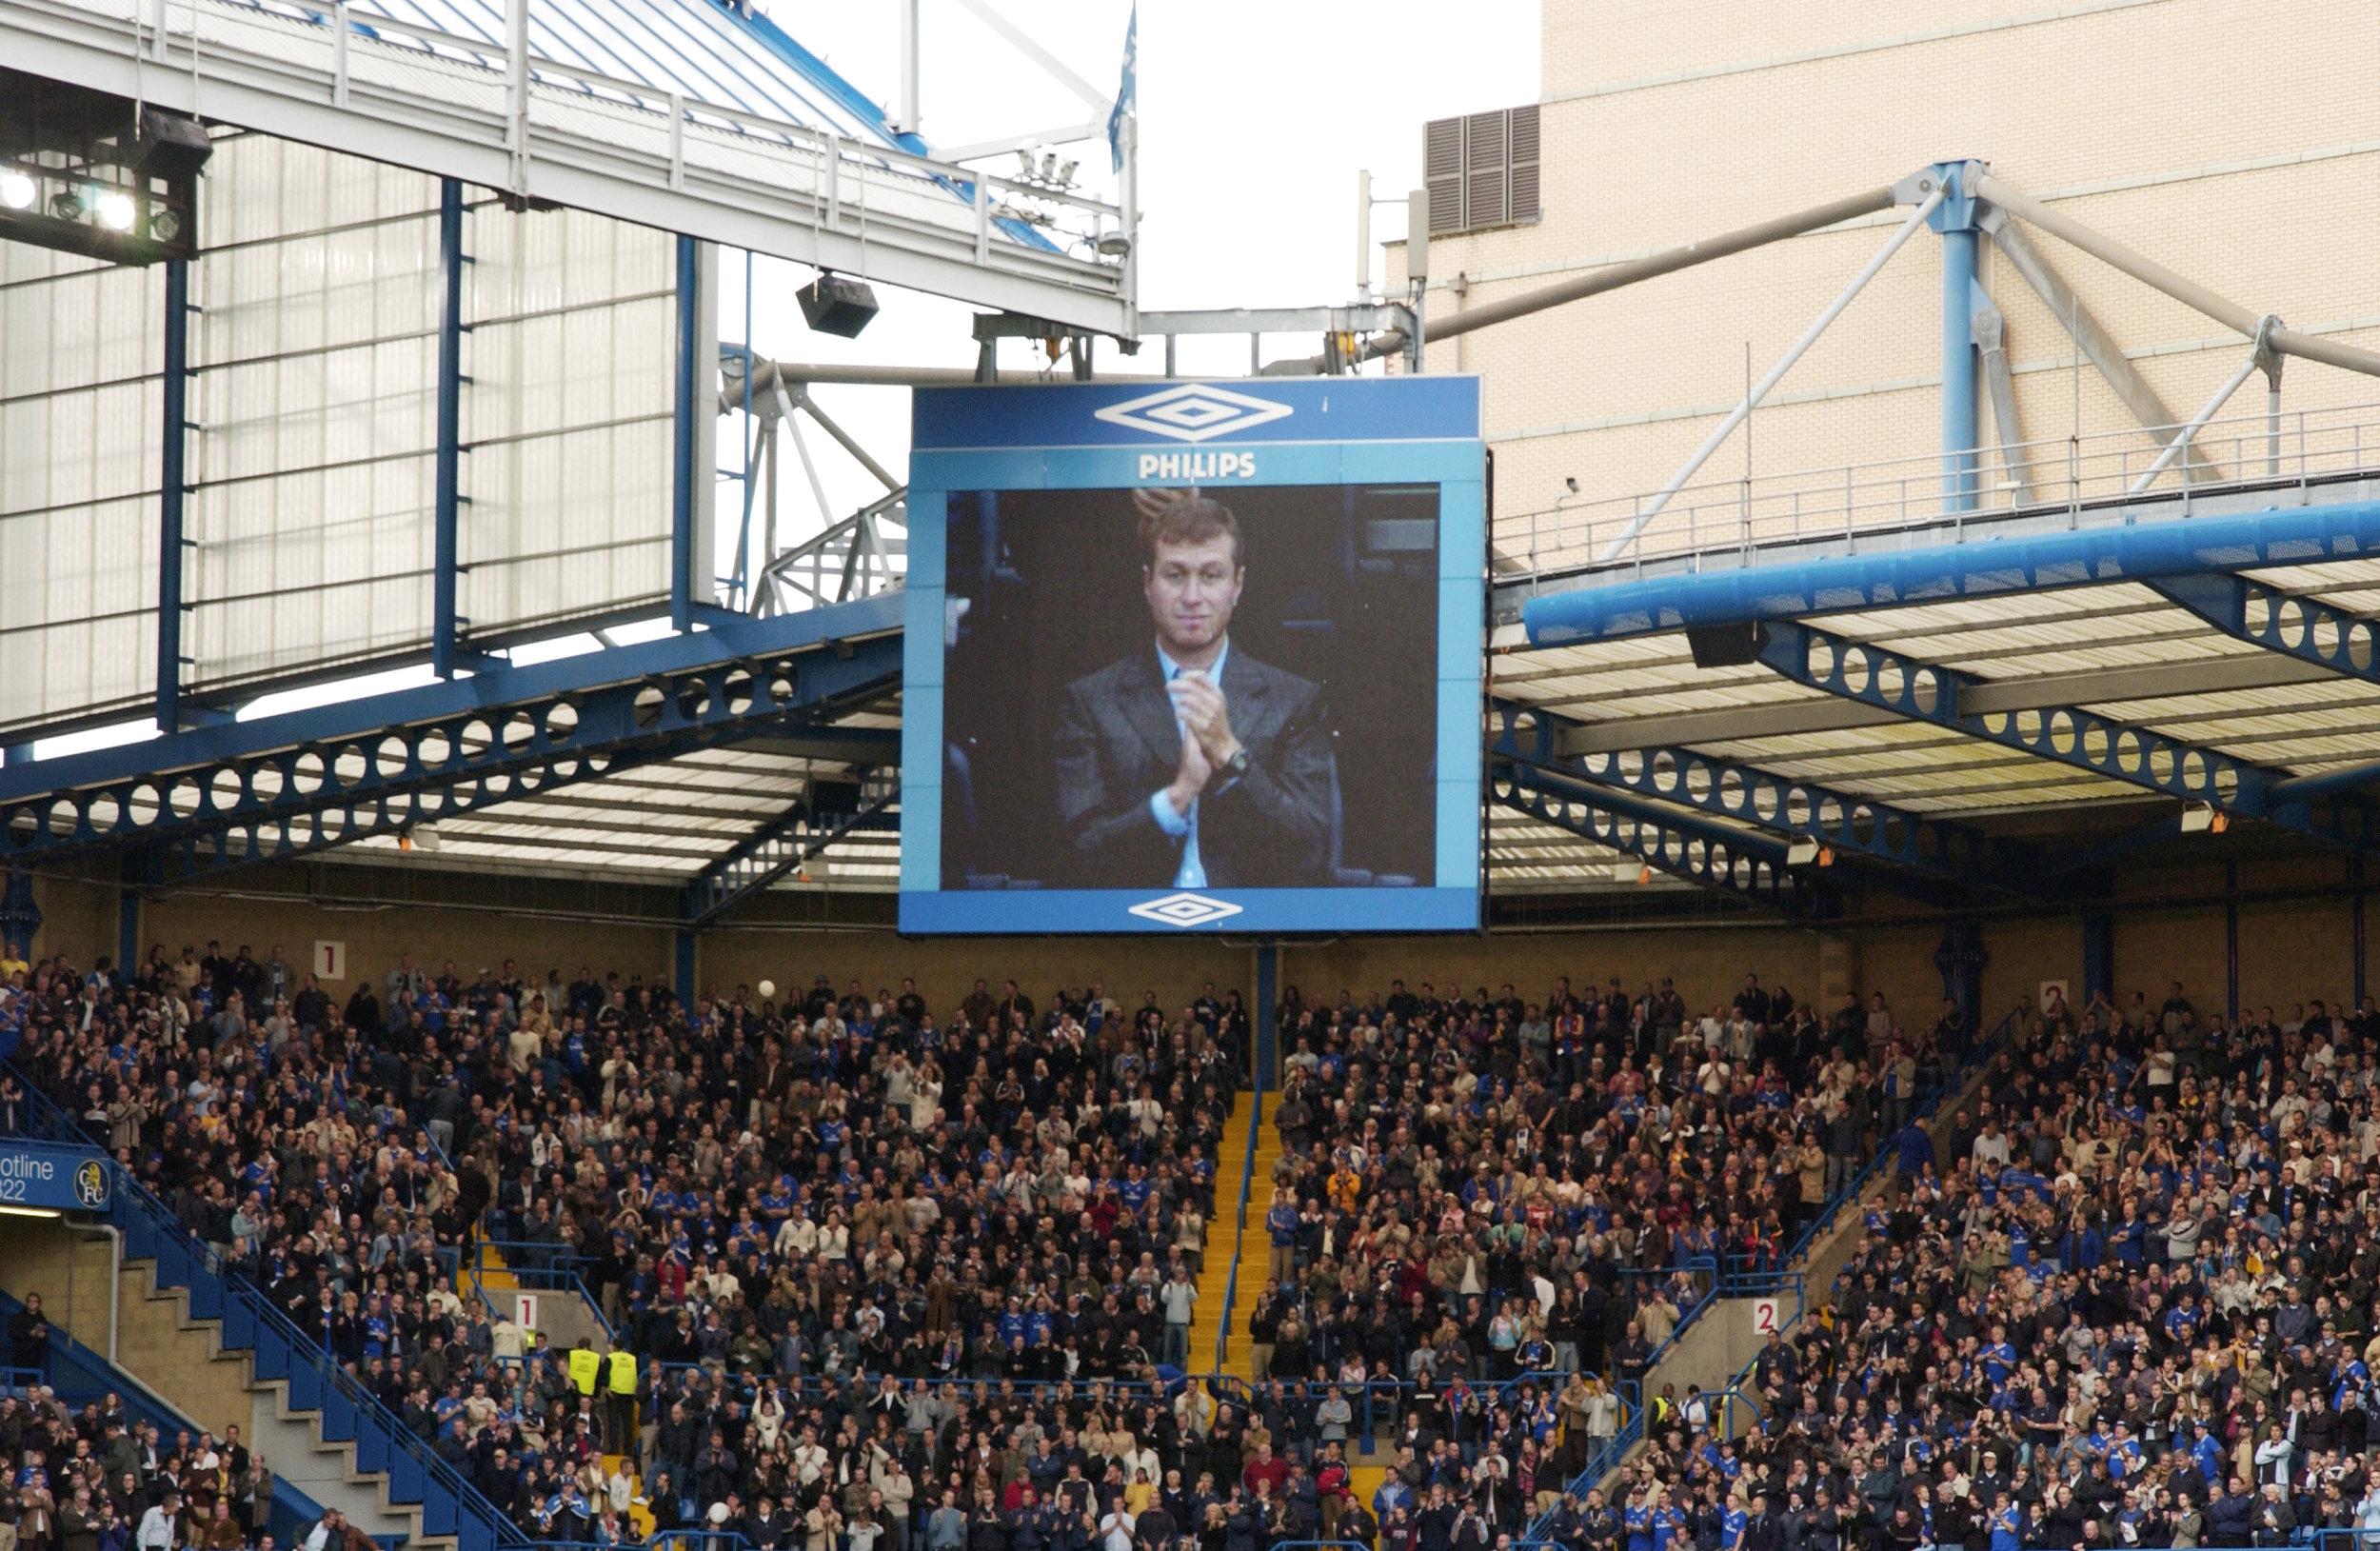 Chelsea owner Roman Abramovich at Stamford Bridge, 2003. (John Ingledew/Chelsea FC via Getty Images)